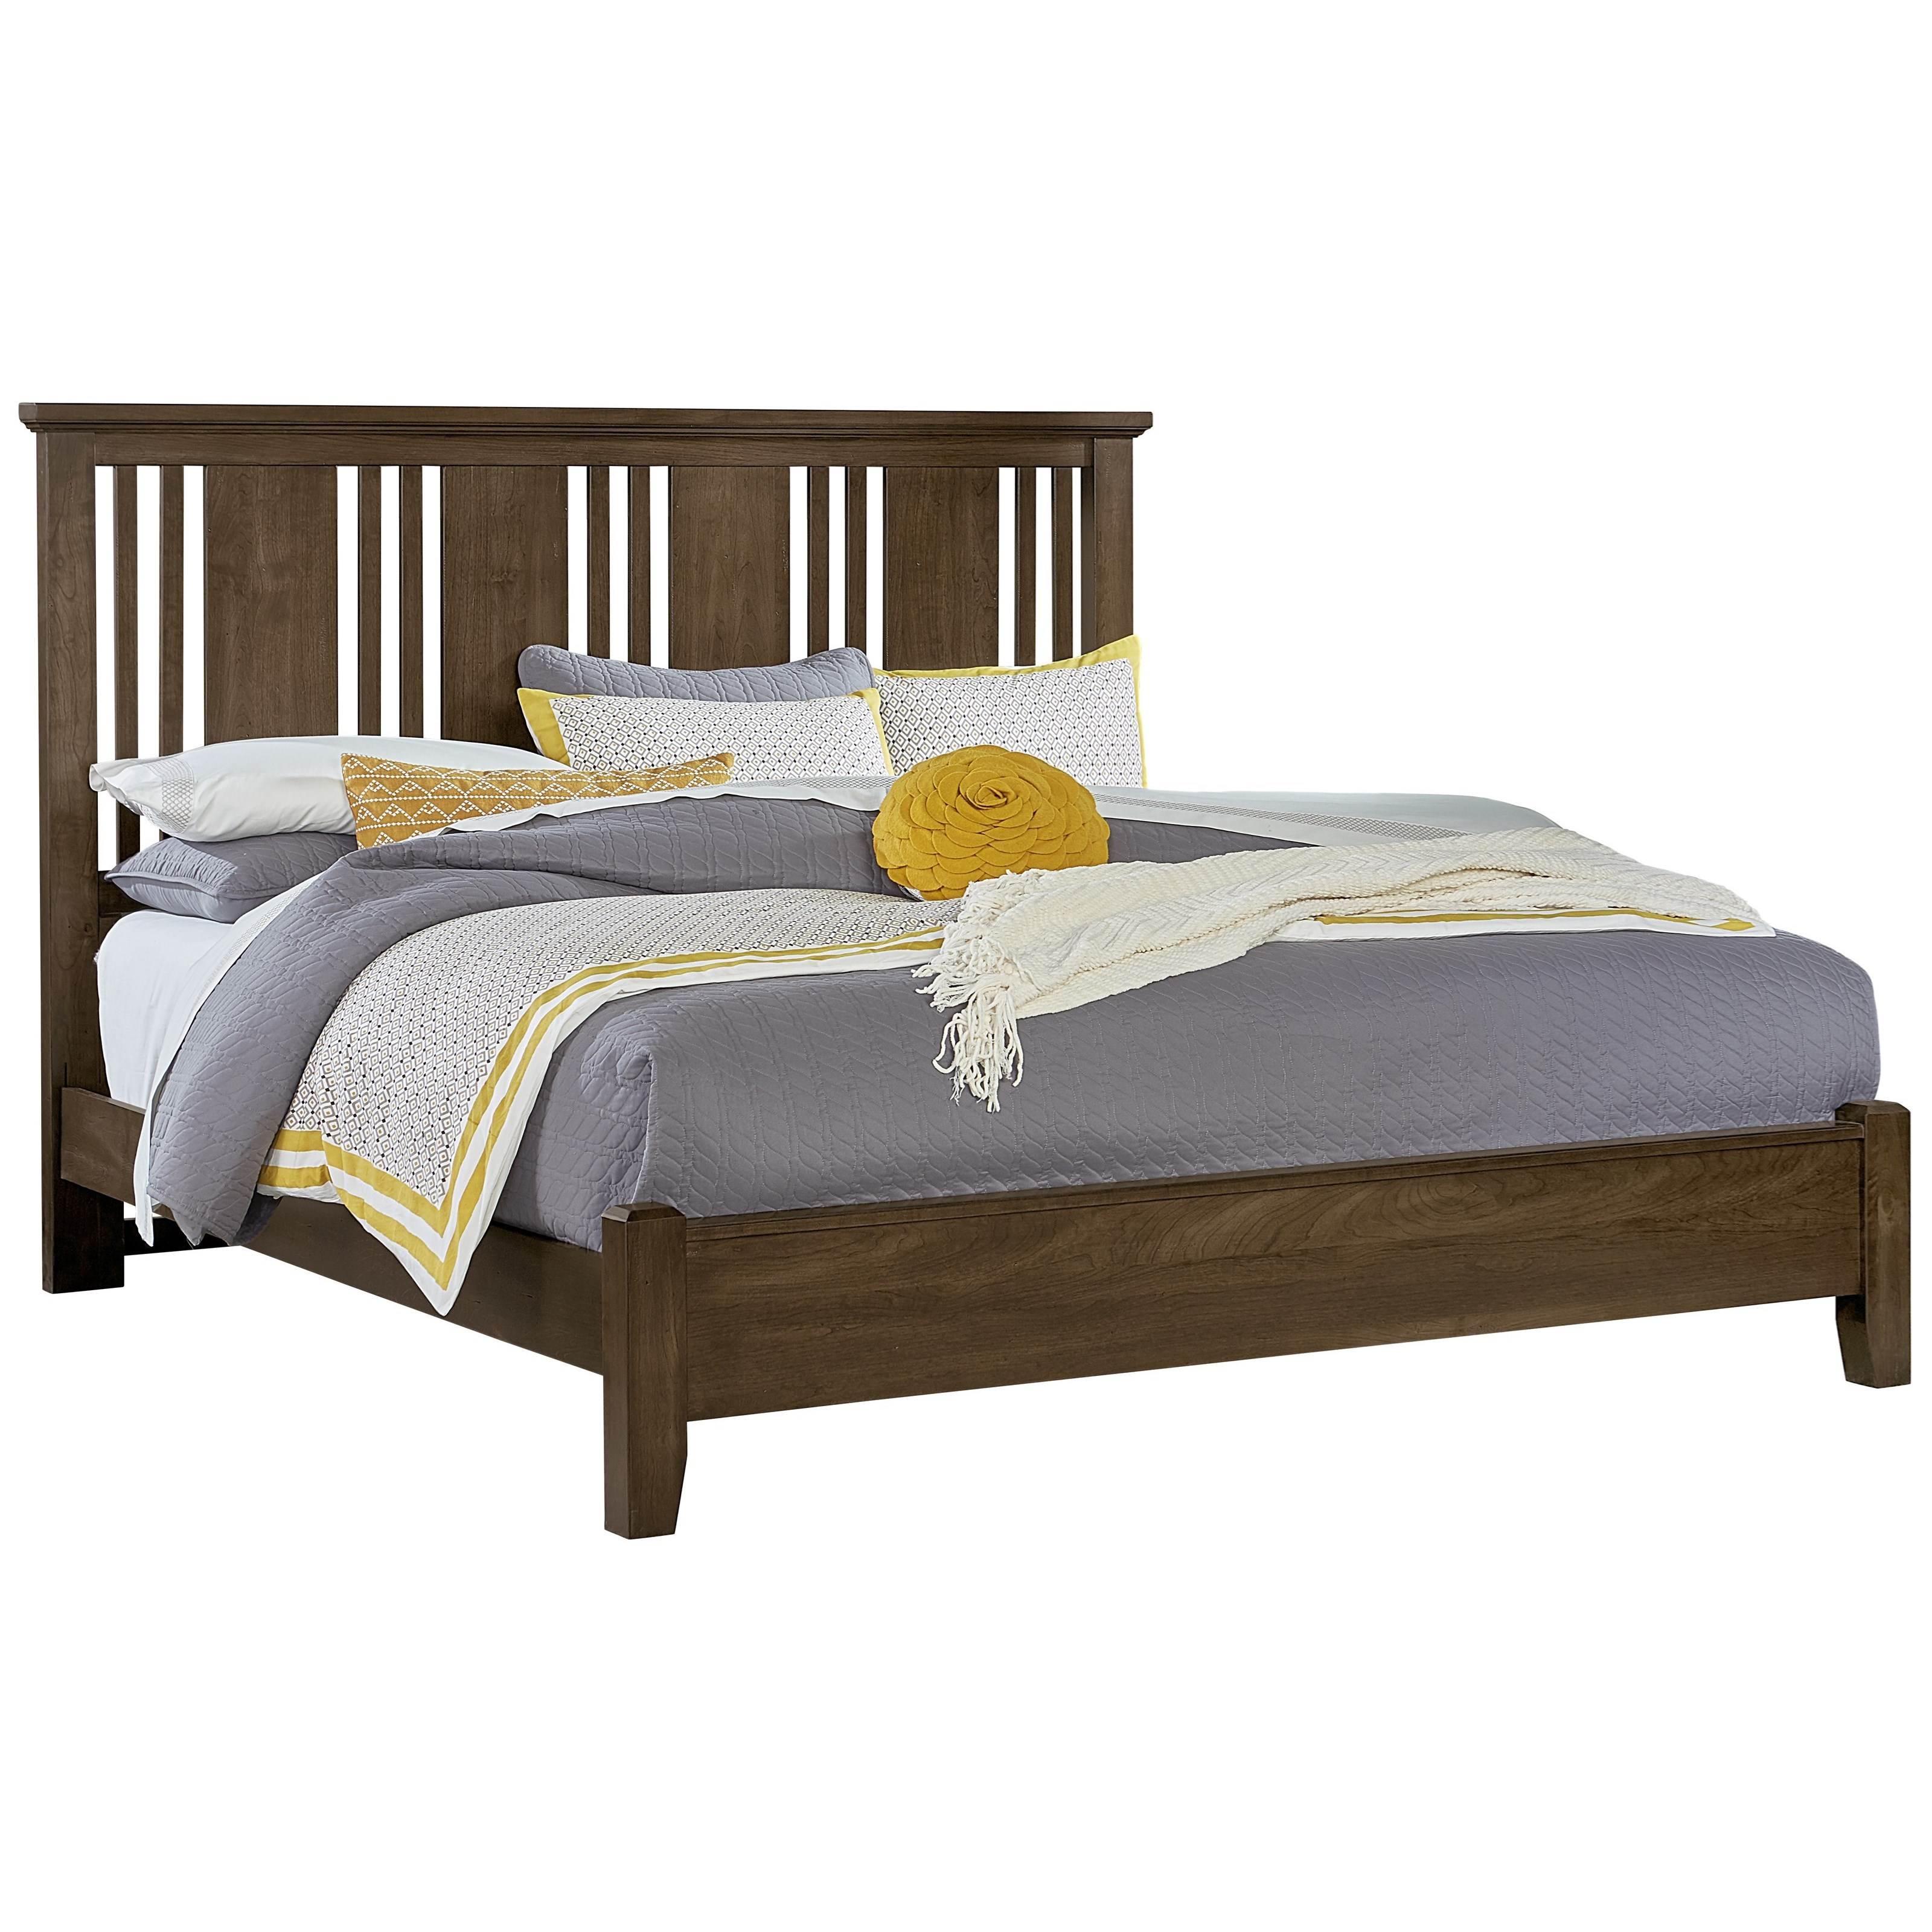 Vaughan Bassett American Cherry King Craftsman Bed - Item Number: 417-667+766+922+MS2